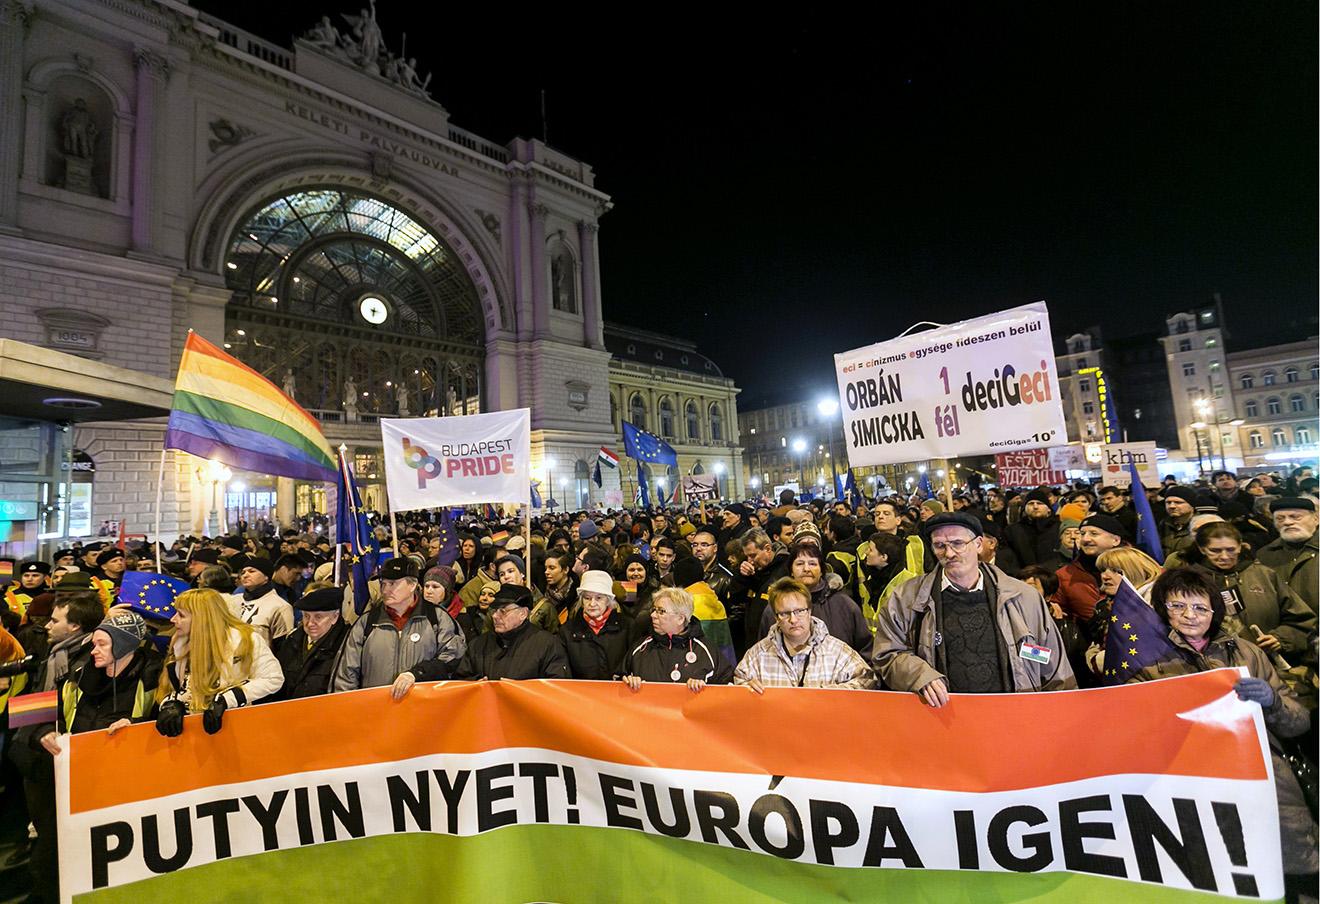 Протест против визита Владимира Путина в Будапеште. Надпись на баннере гласит: «Путин — нет! Европа — да!» Фото: Balazs Mohai / AP